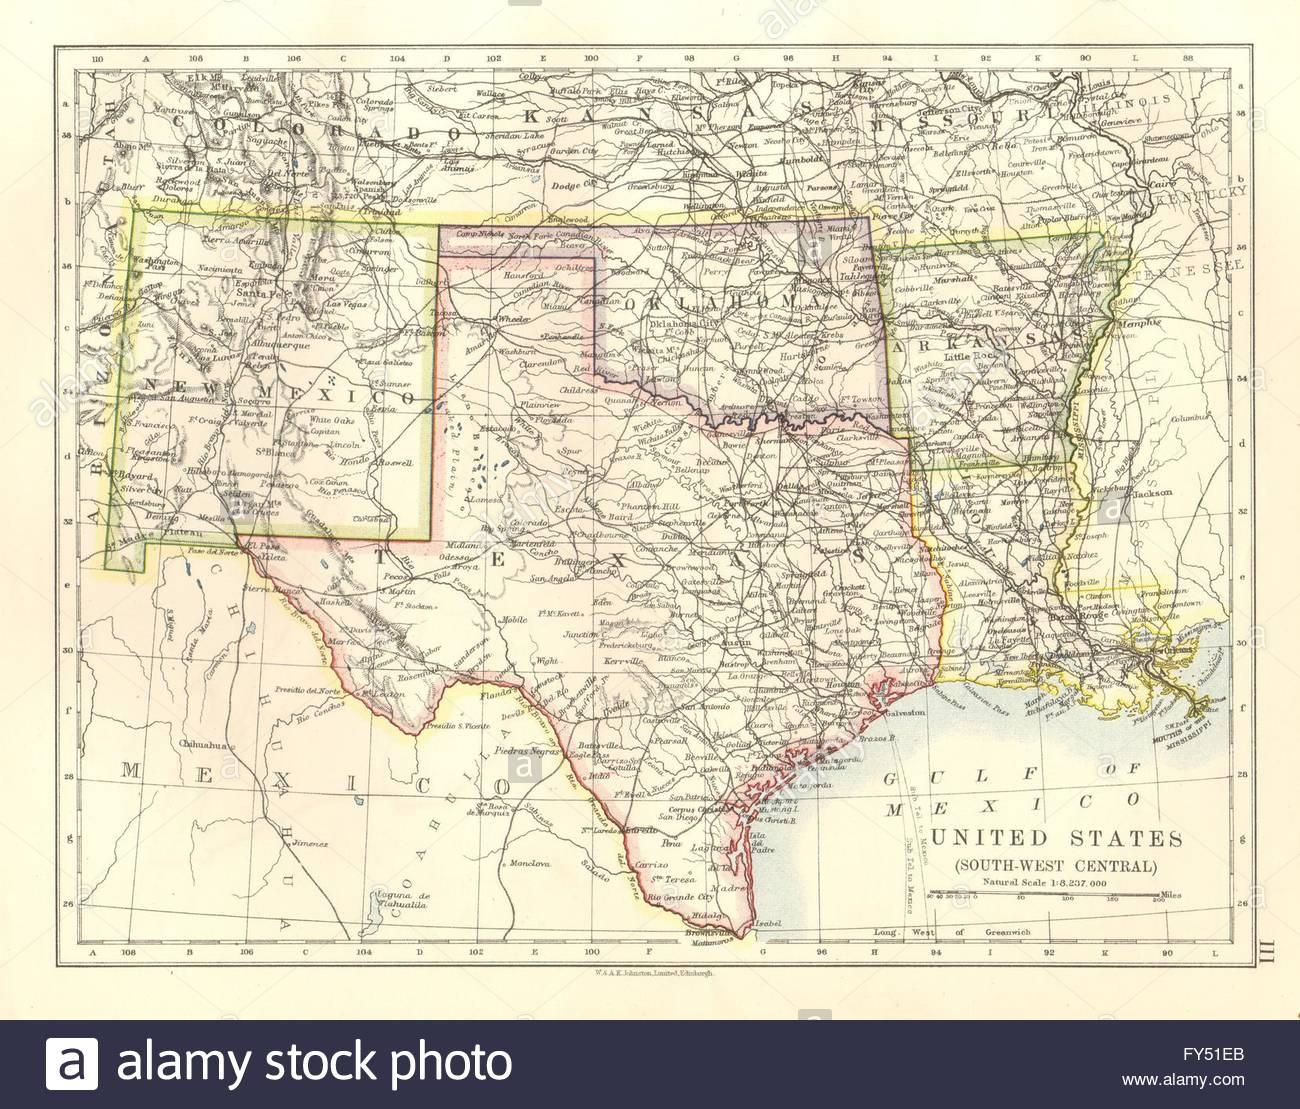 Usa South Central.texas Oklahoma Arkansas New Mexico Louisiana, 1920 - Texas New Mexico Map